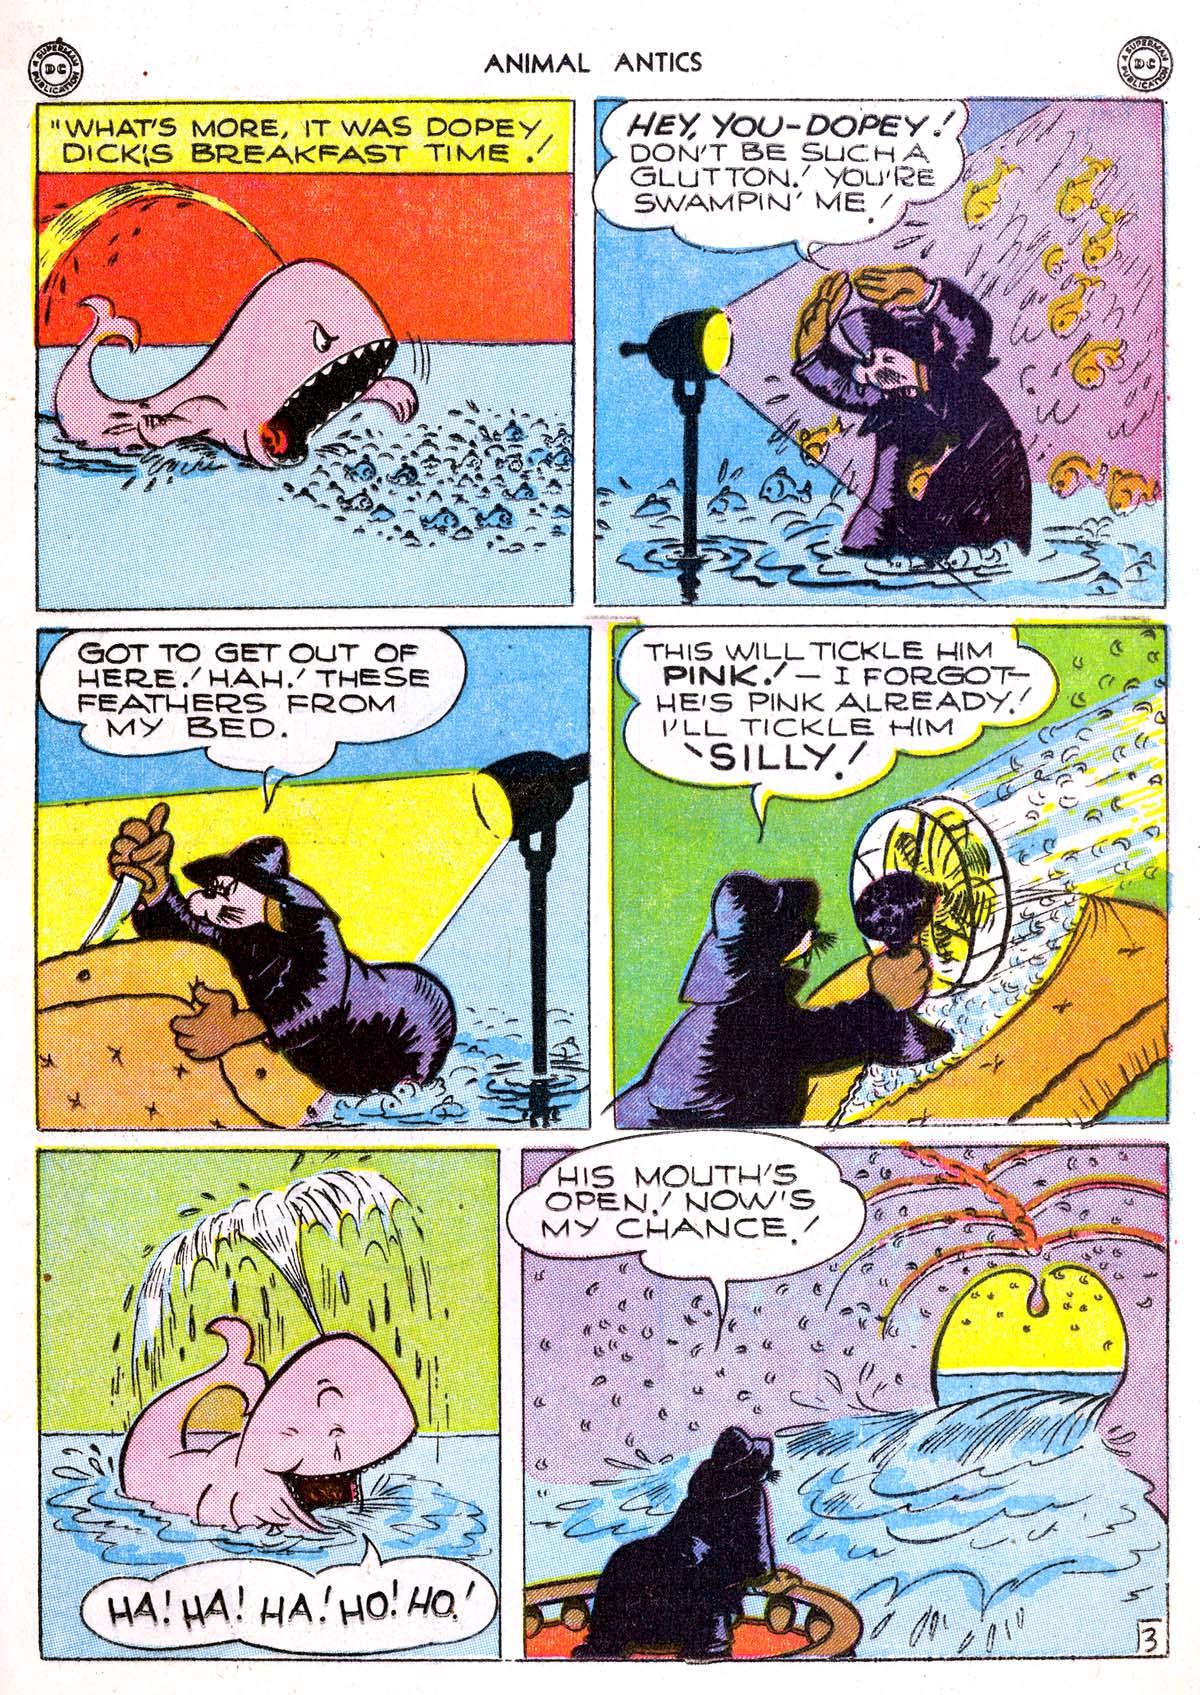 Read online Animal Antics comic -  Issue #1 - 29